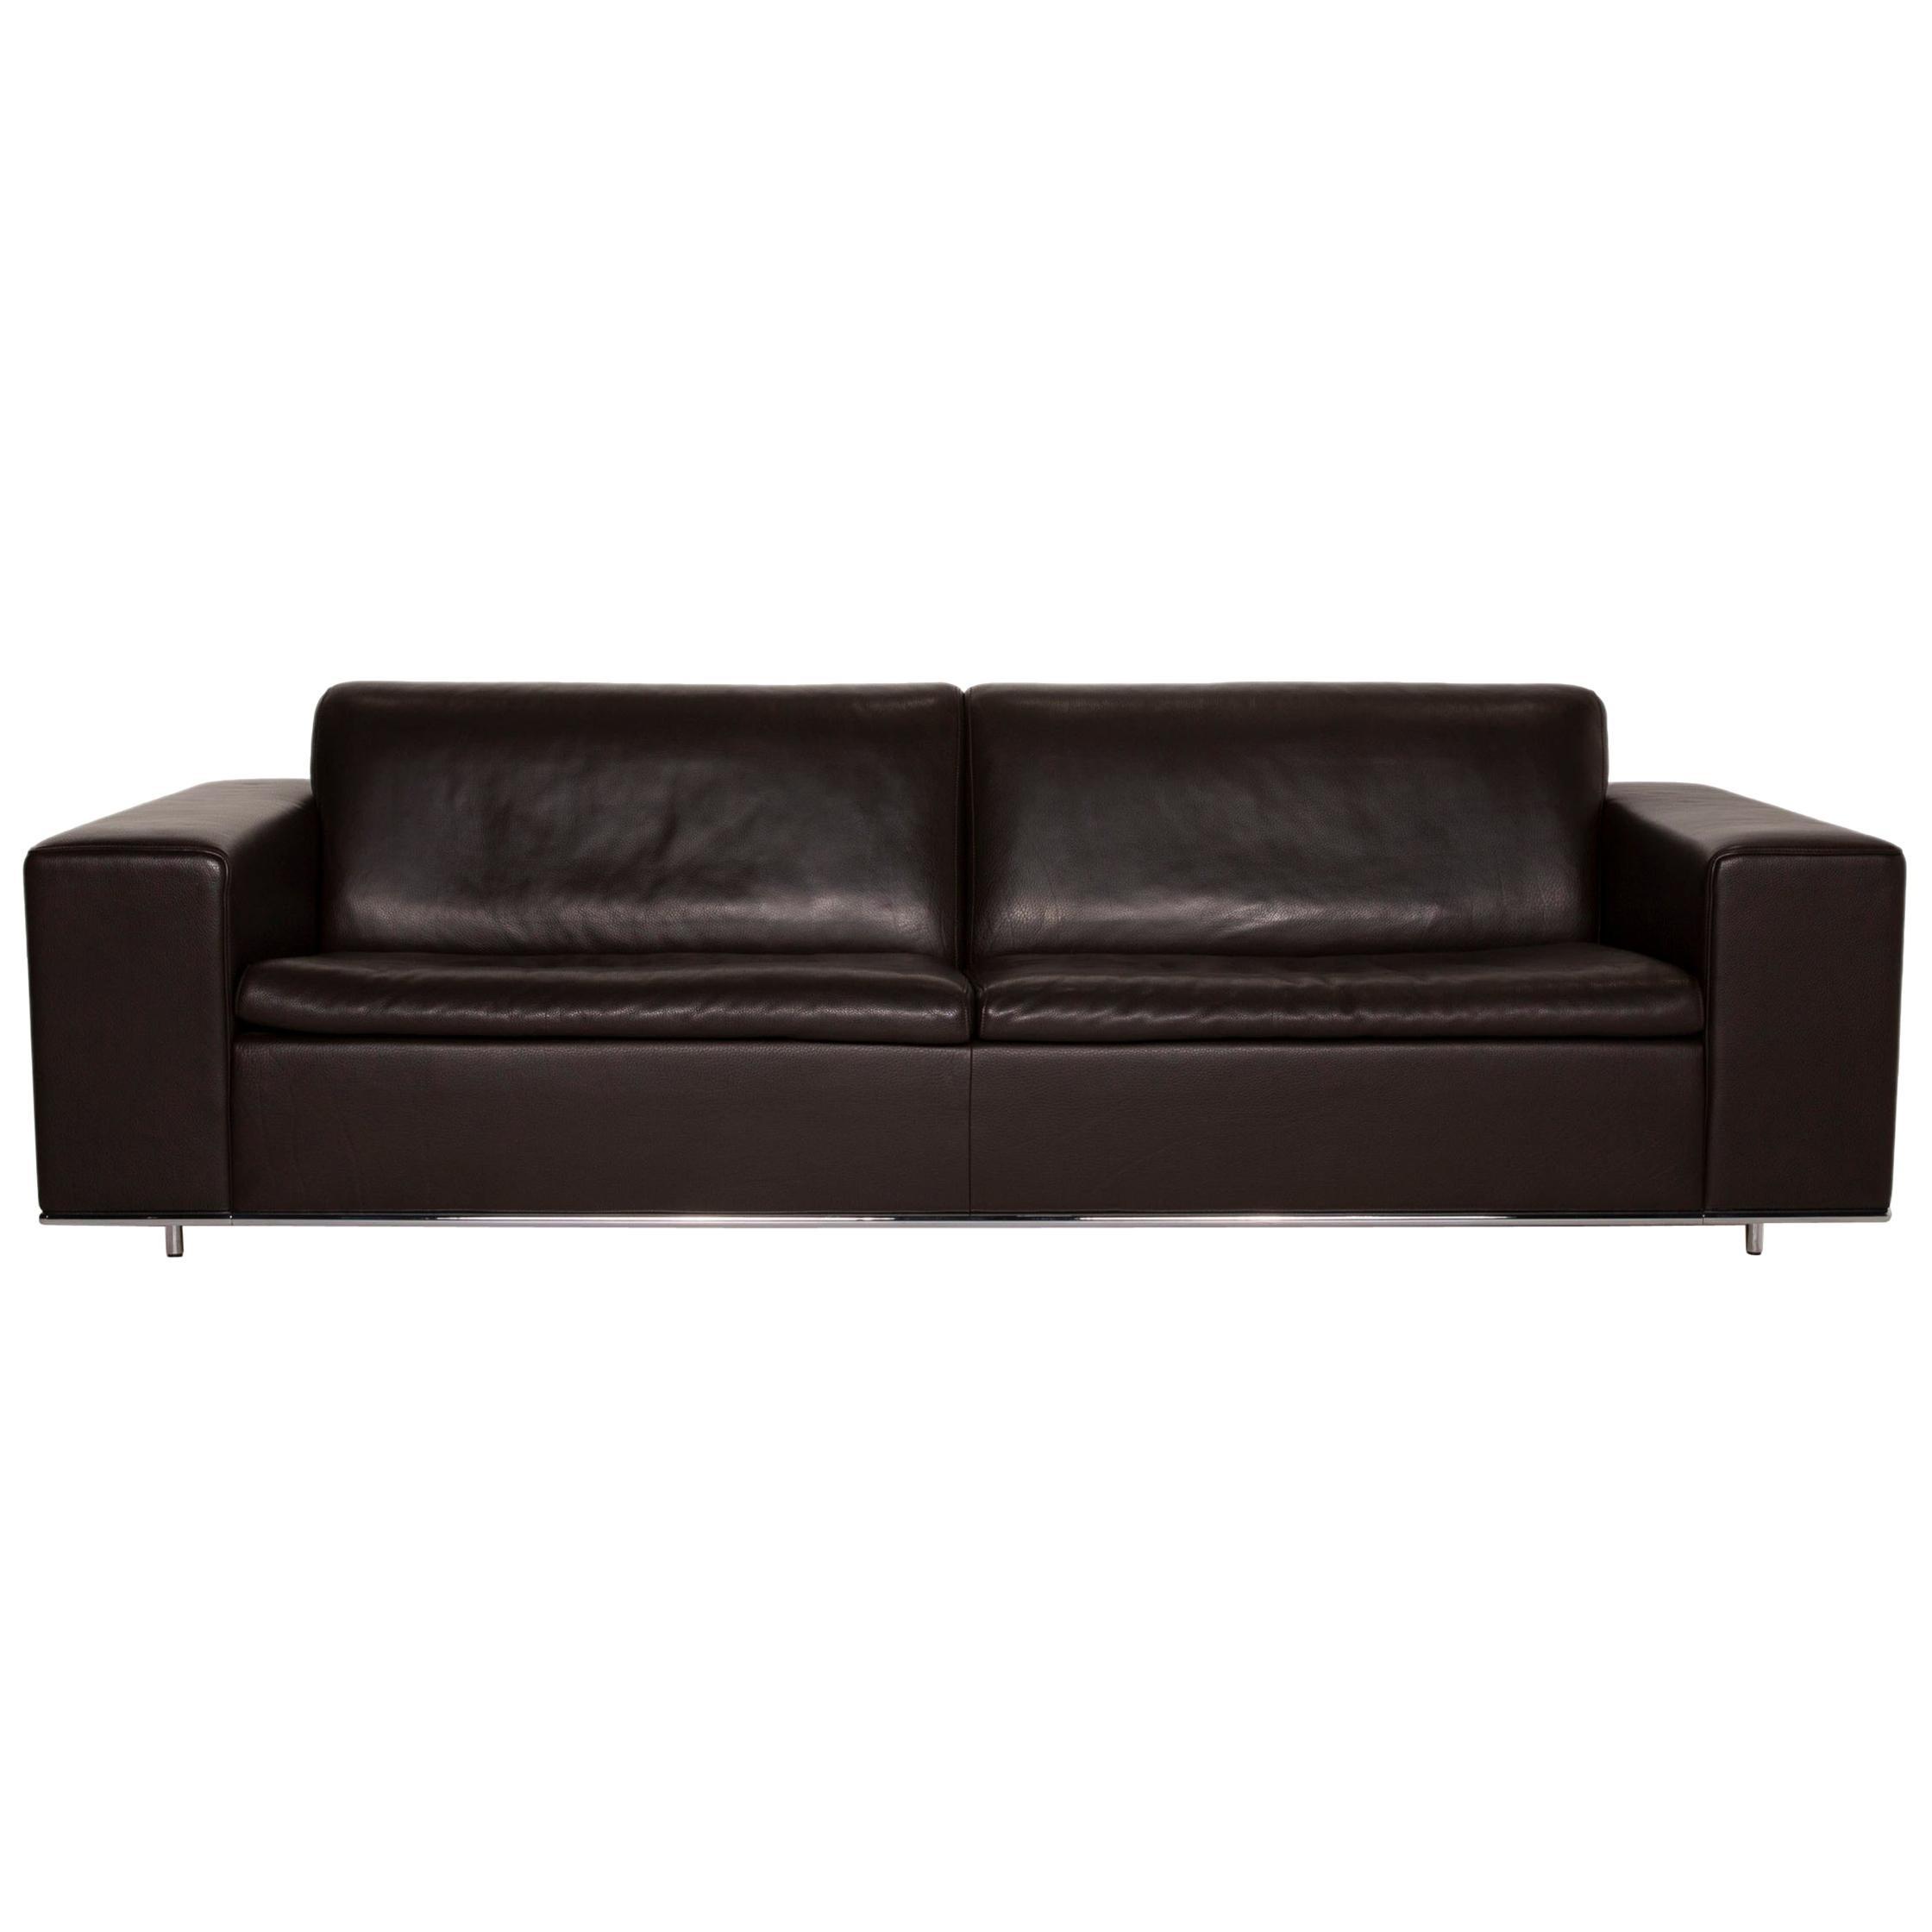 De Sede Leather Sofa Brown Three-Seater